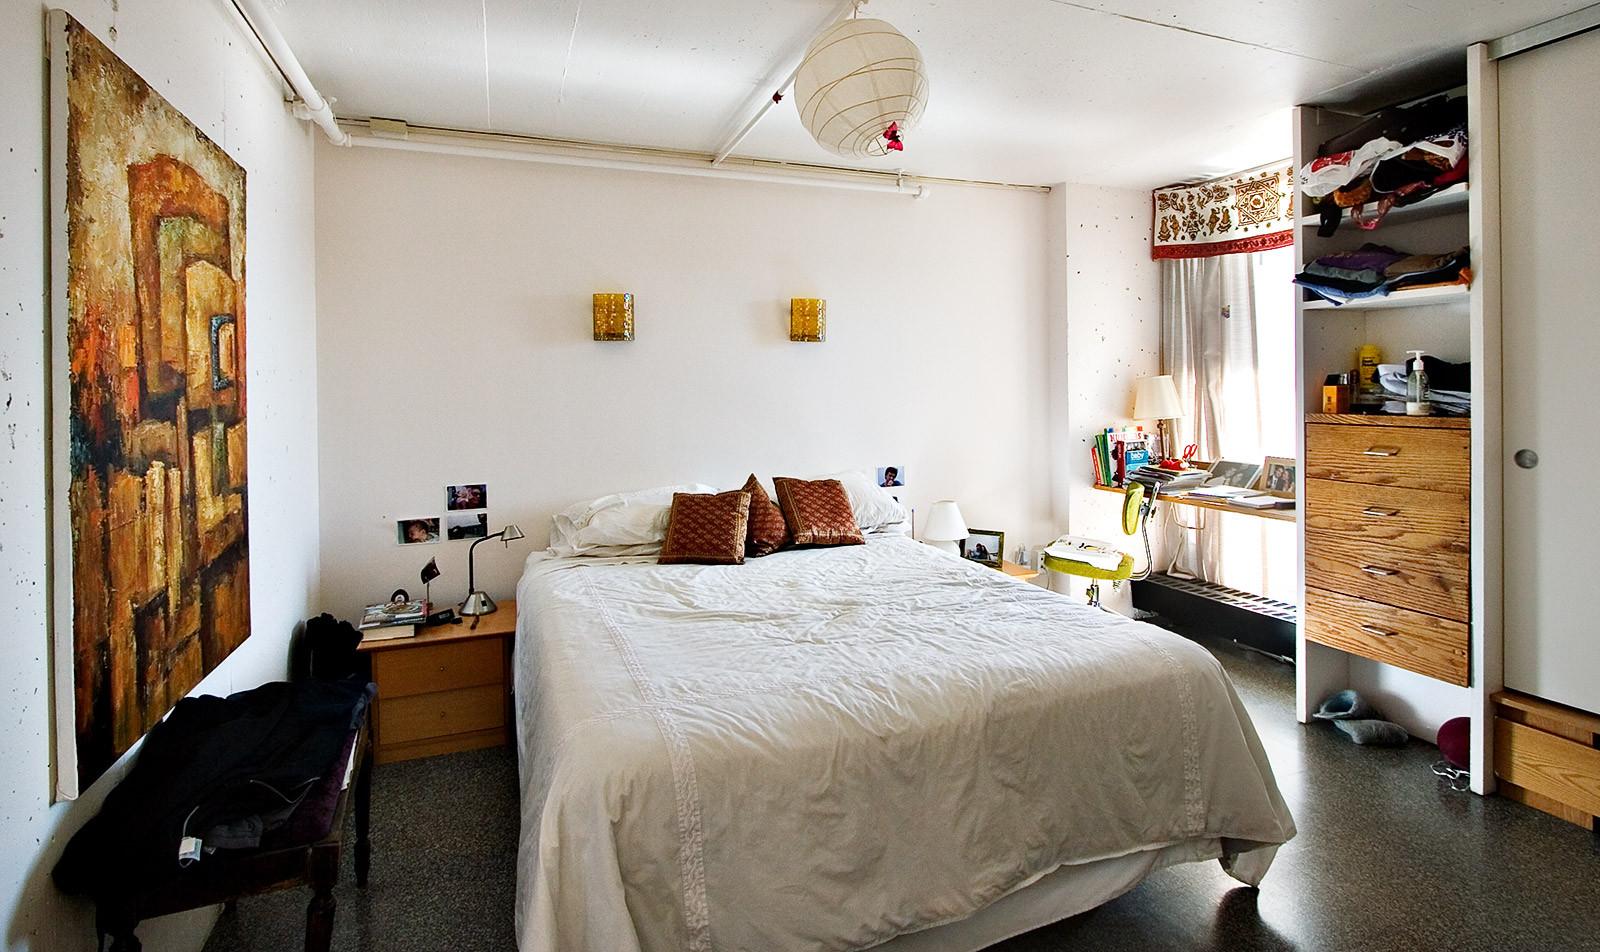 Bedroom Interior Size